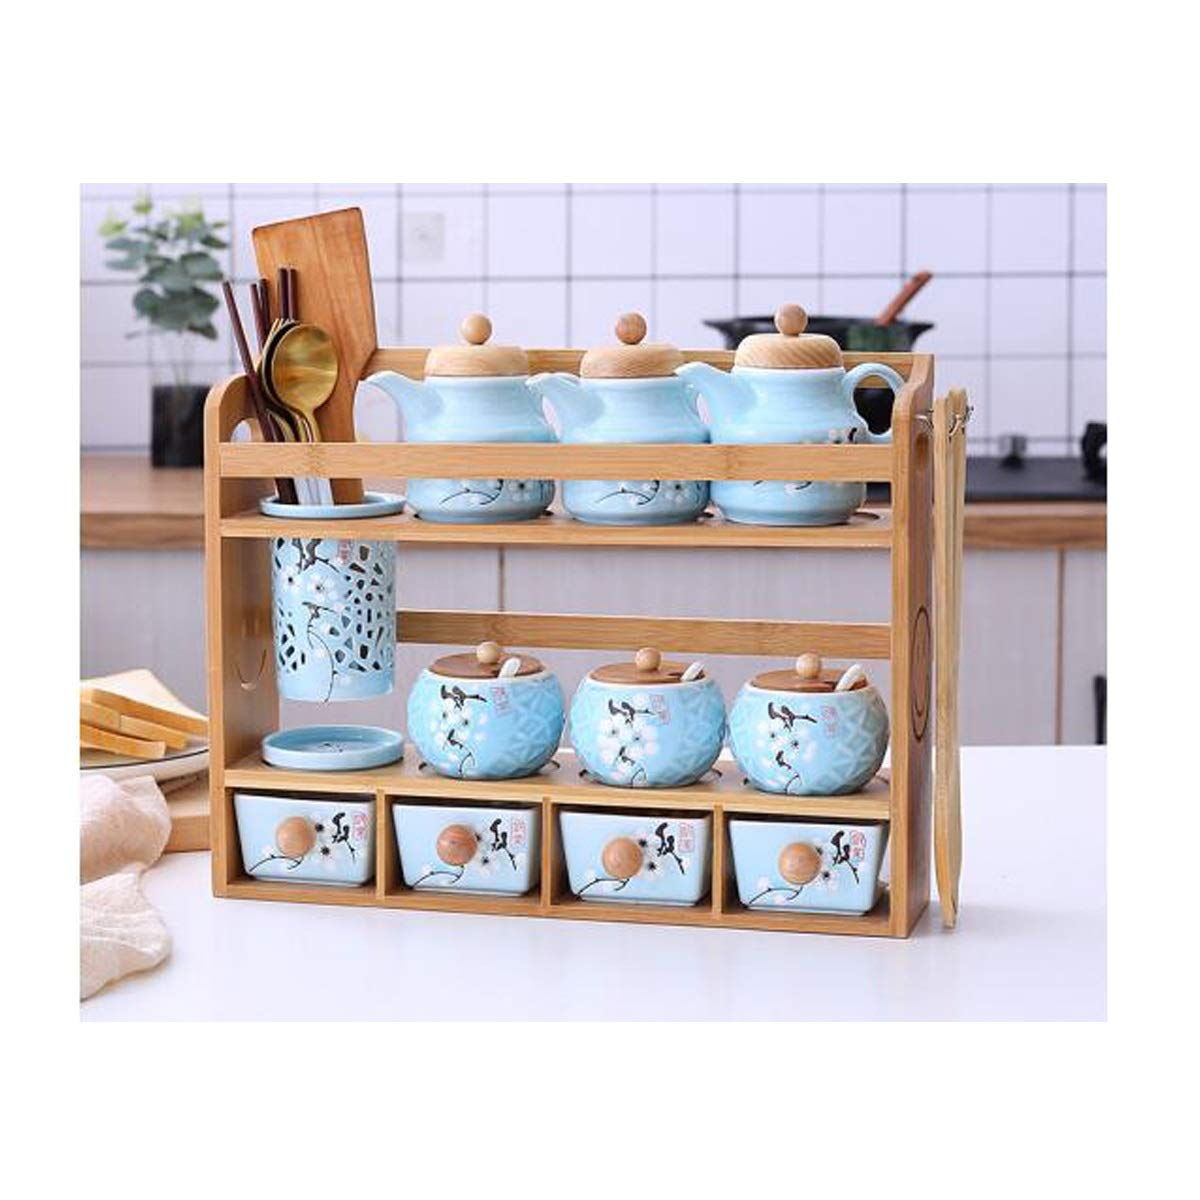 MINGRUIGONGMAO Spice jar set sealed cans seasoning jar ceramic seasoning box salt pot oil pot combination with shelf kitchen rack storage combination, blue Plush toys (Color : Blue-B) by MINGRUIGONGMAO